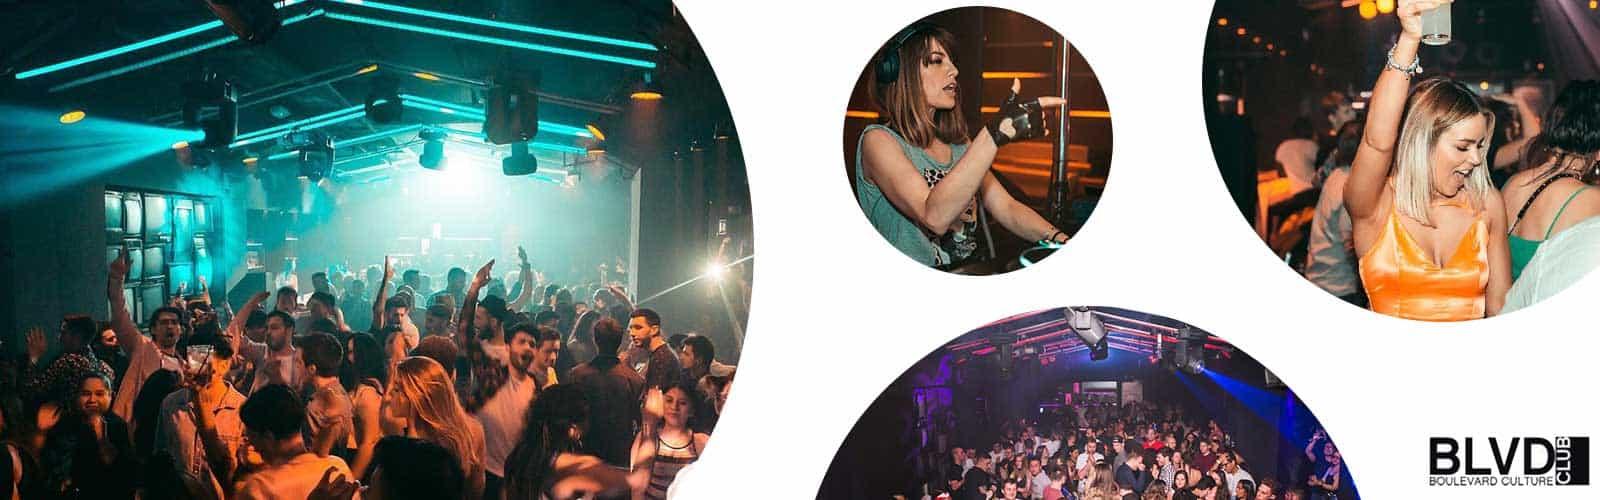 Boulevard Discoteca Barcelona